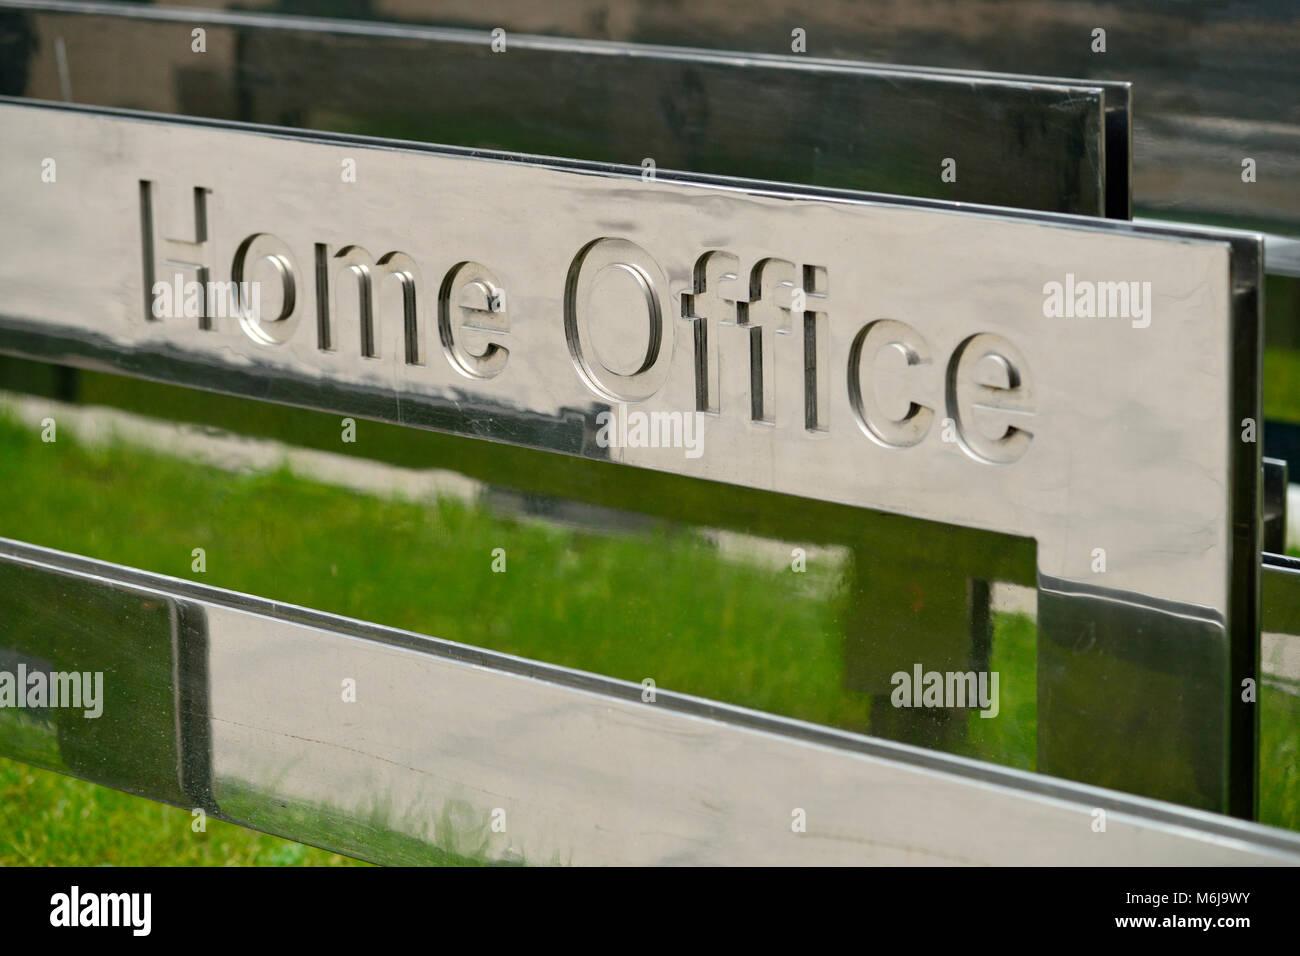 Home Office, Marsham Street, London, United Kingdom - Stock Image